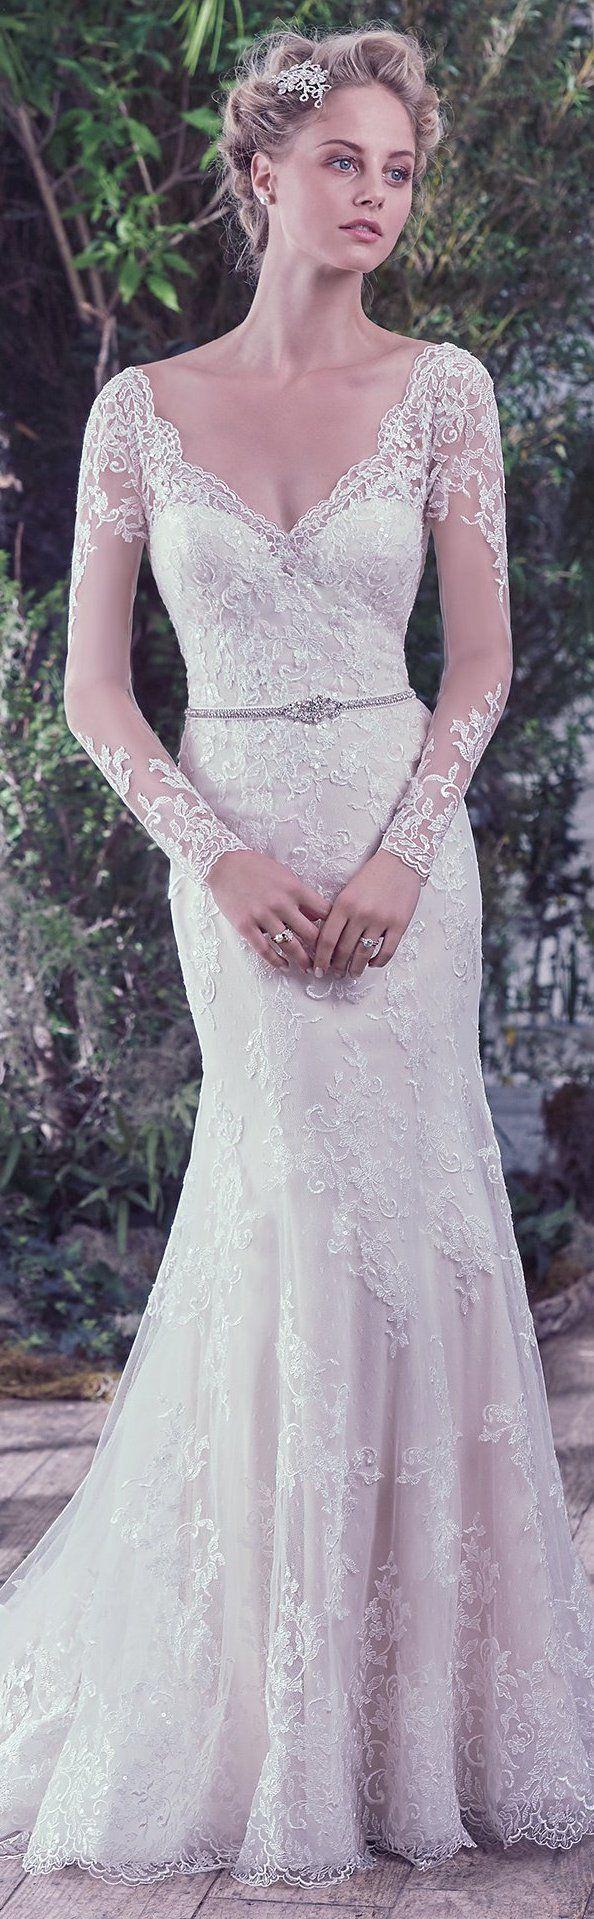 Ronald joyce lace wedding dress september 2018  best Wedding Winter Wonderland Theme images on Pinterest